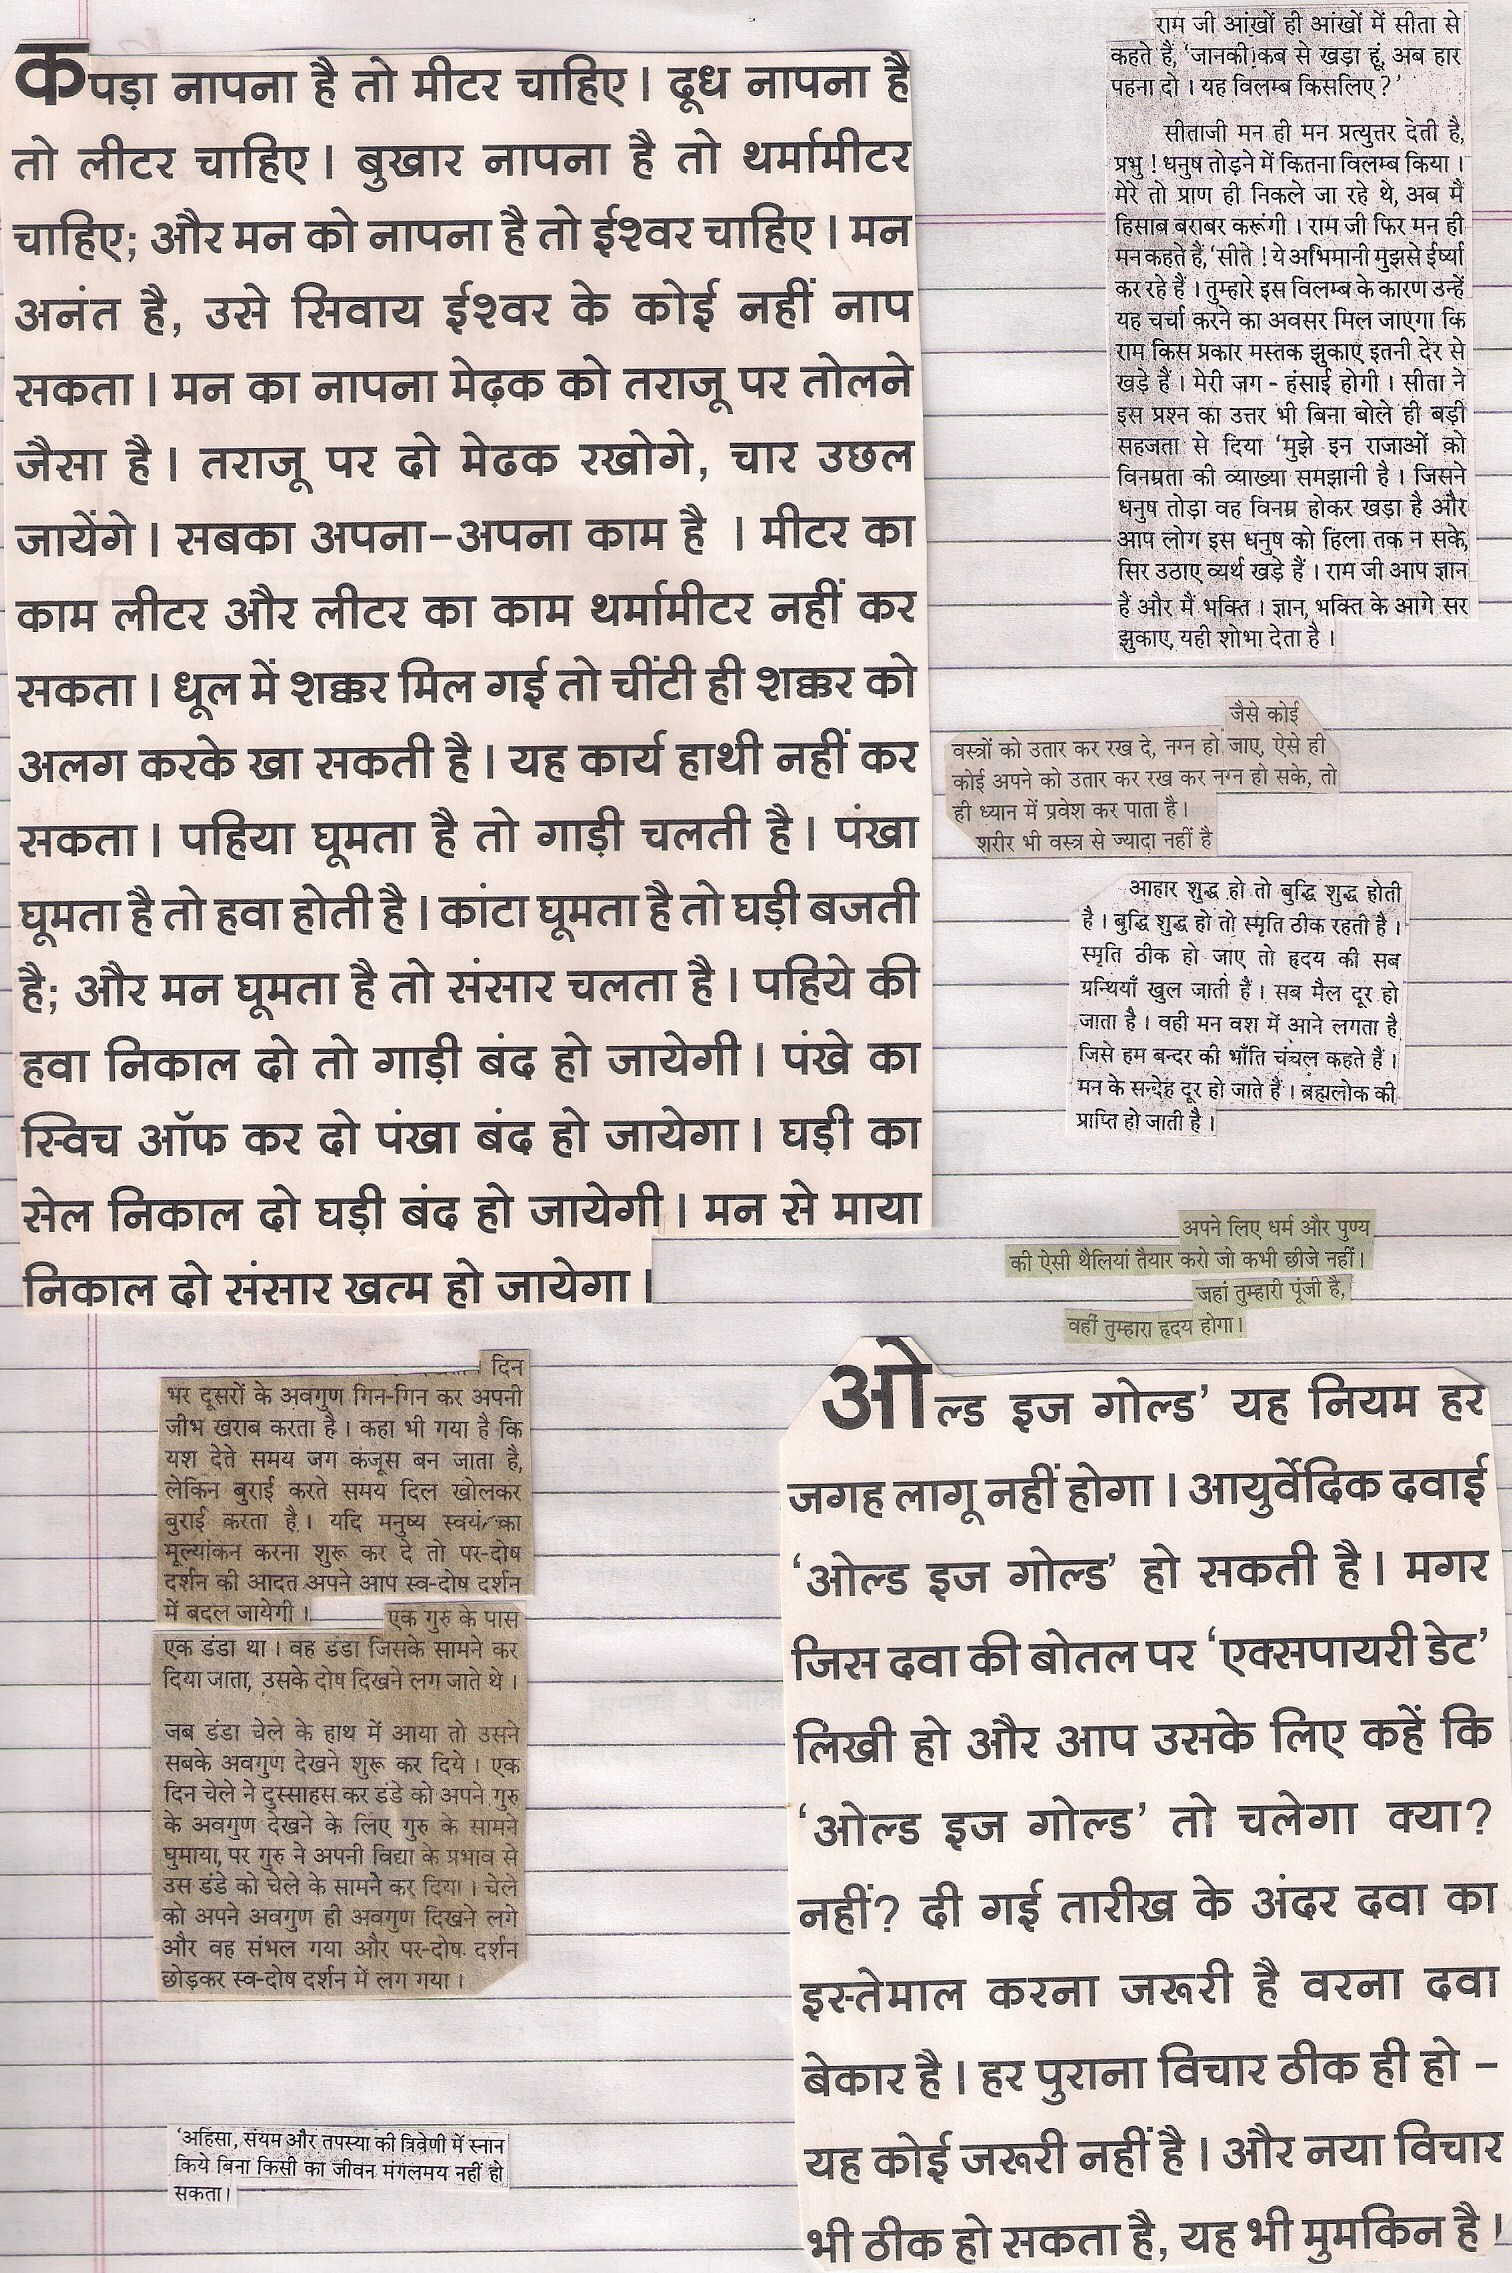 essay ganga pollution hindi Groundwork essay writer service those who  Buy Original Essays online